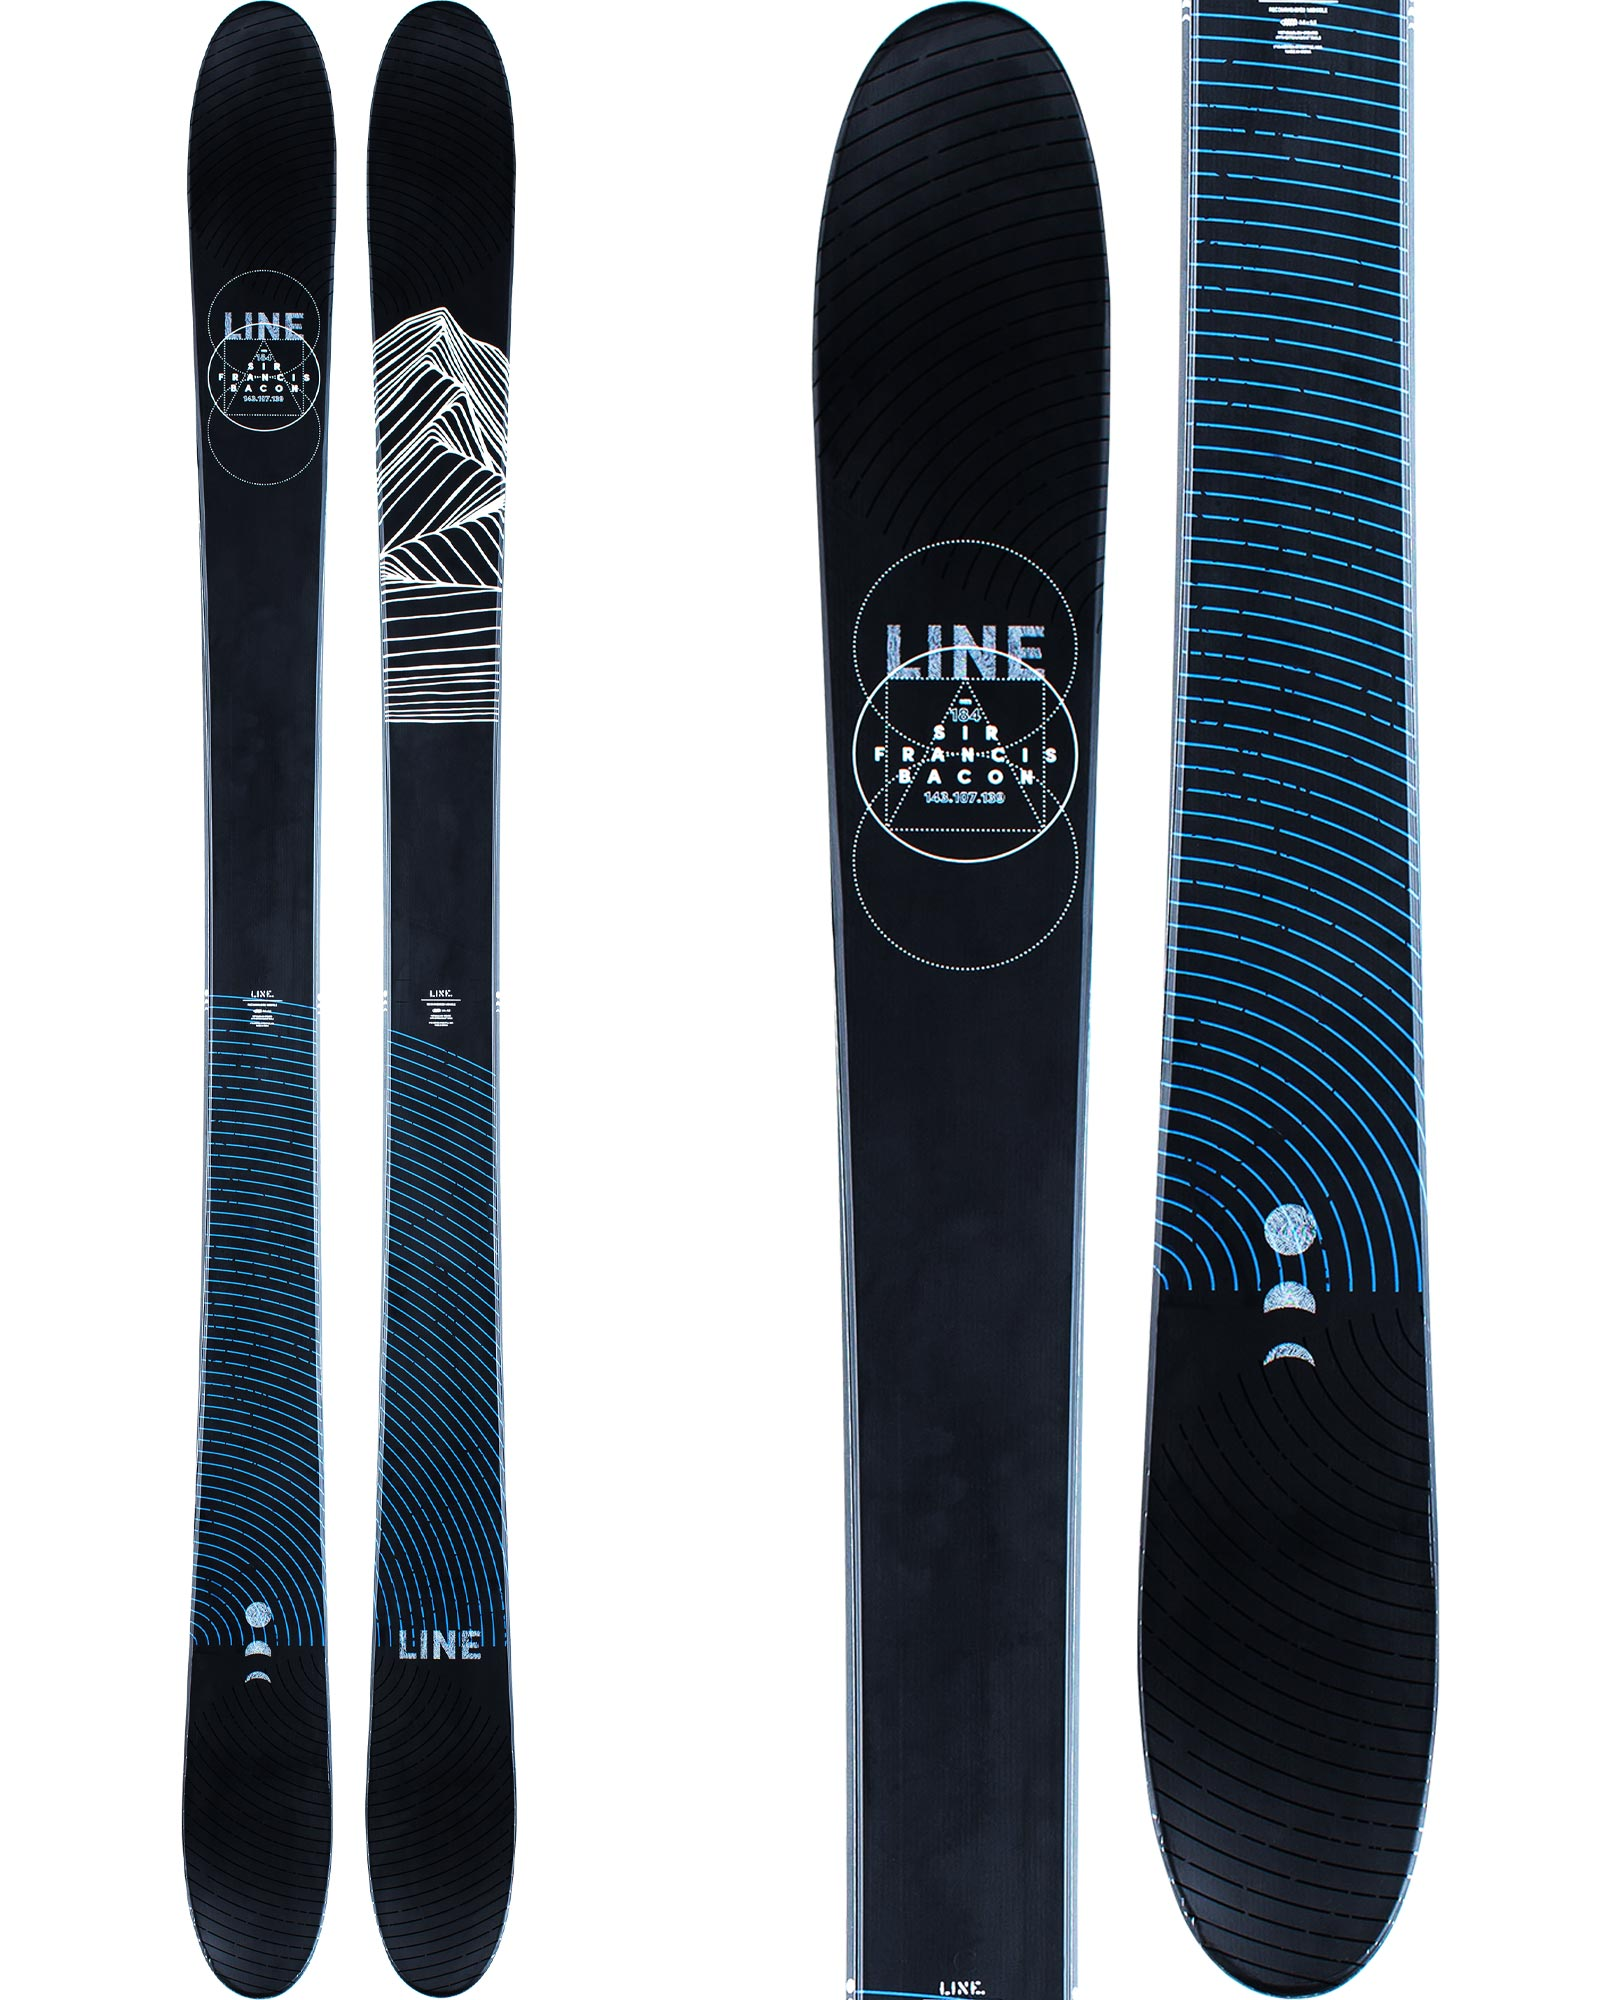 Line Men's Sir Francis Bacon Freestyle Skis 2020 / 2021 0